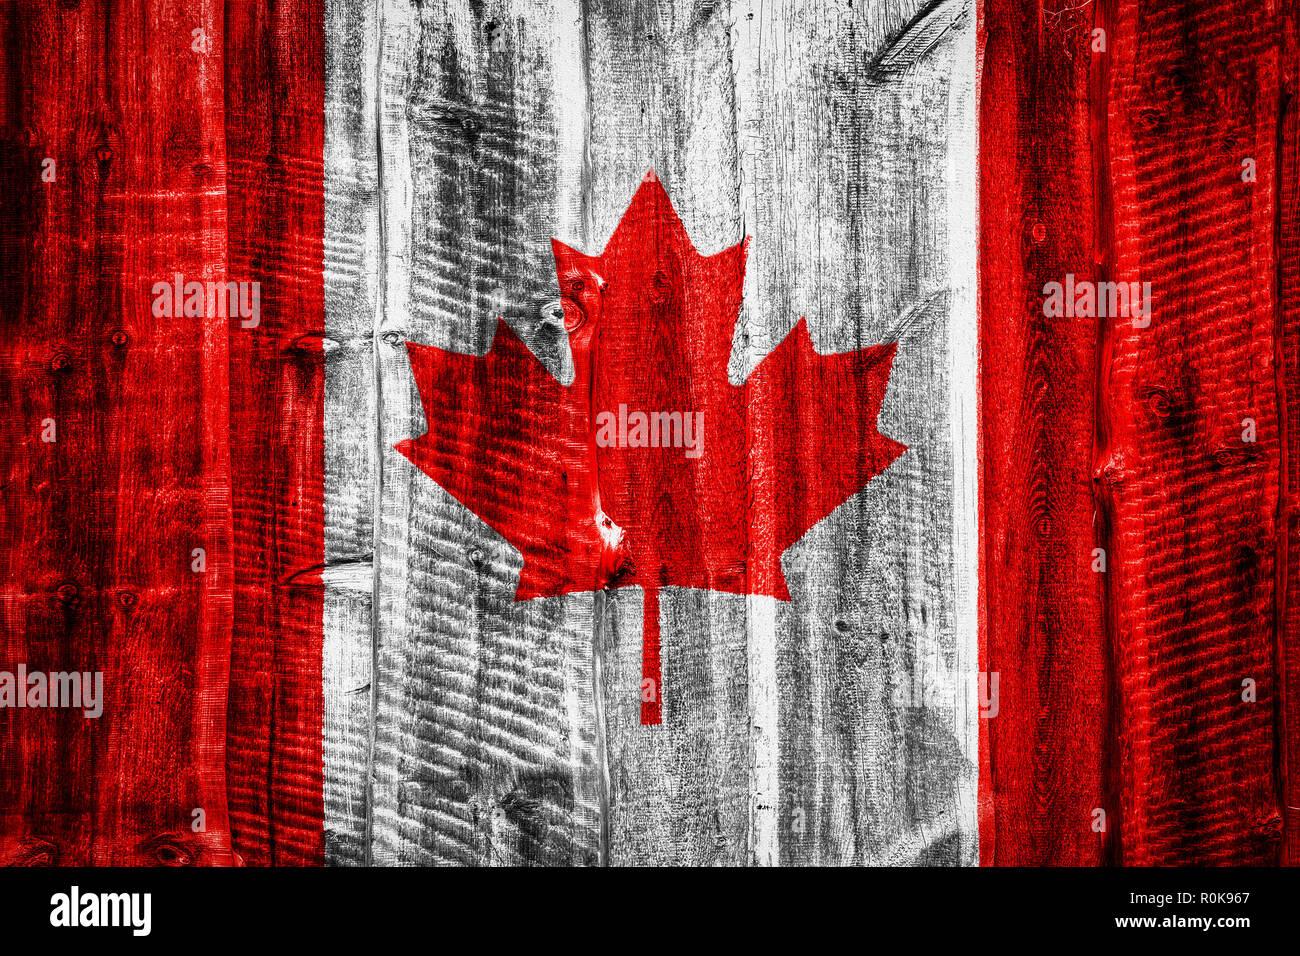 Canadian Flag Wallpaper Background Imágenes De Stock